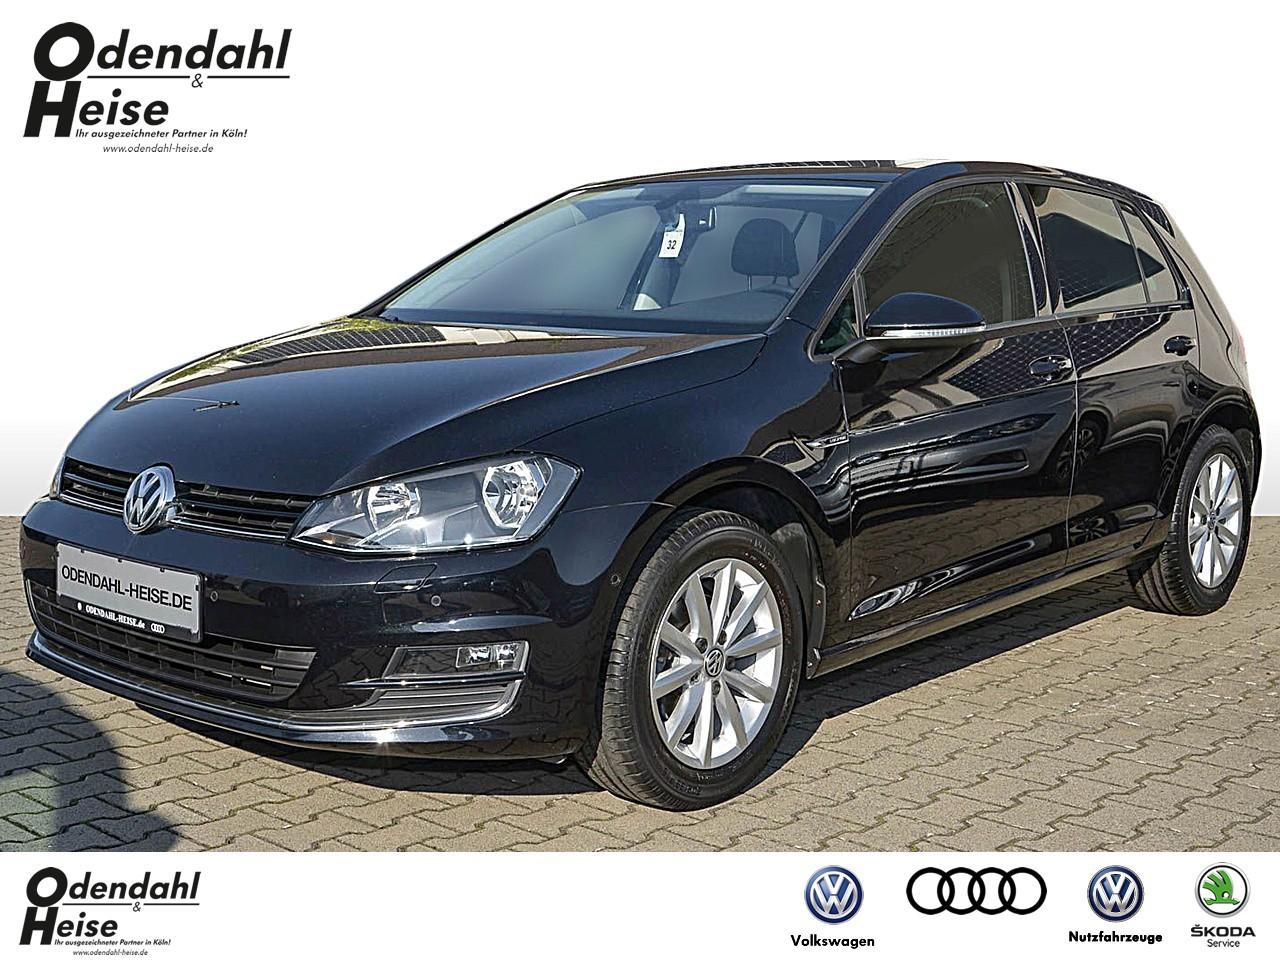 Volkswagen Golf LOUNGE 1,2 l TSI 5-Gang Navi Einparkhilfe, Jahr 2015, Benzin